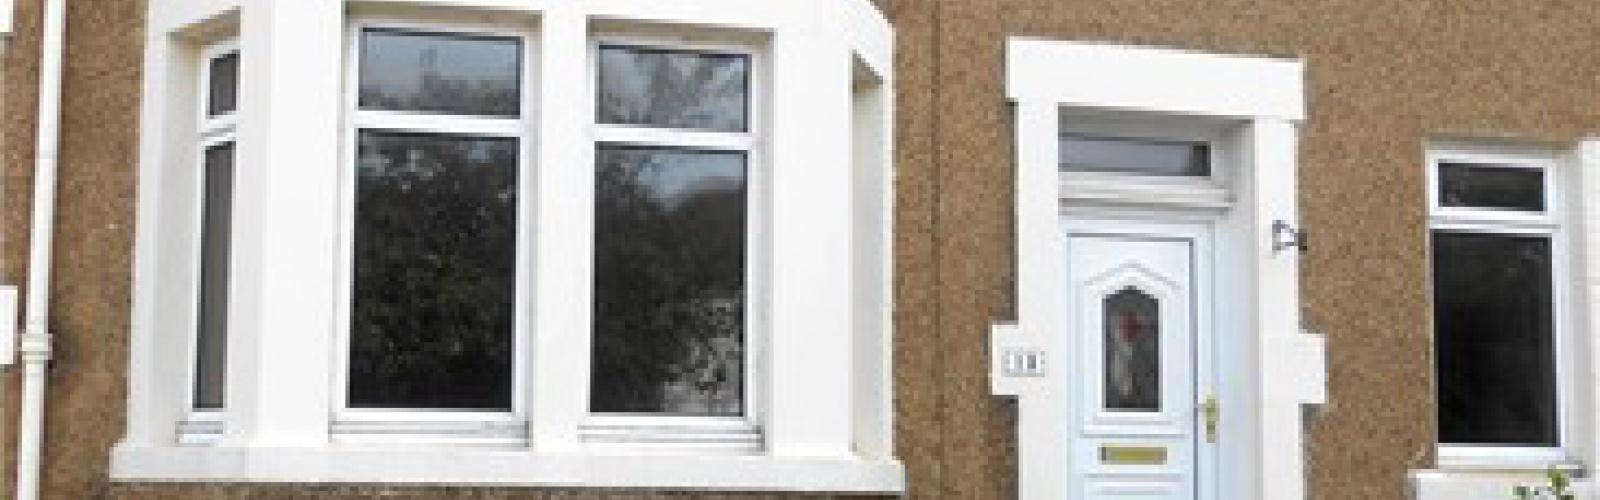 Glendevon Avenue,Edinburgh,EH12,2 Bedrooms Bedrooms,1 BathroomBathrooms,Semi Detached House,Glendevon Avenue,1006